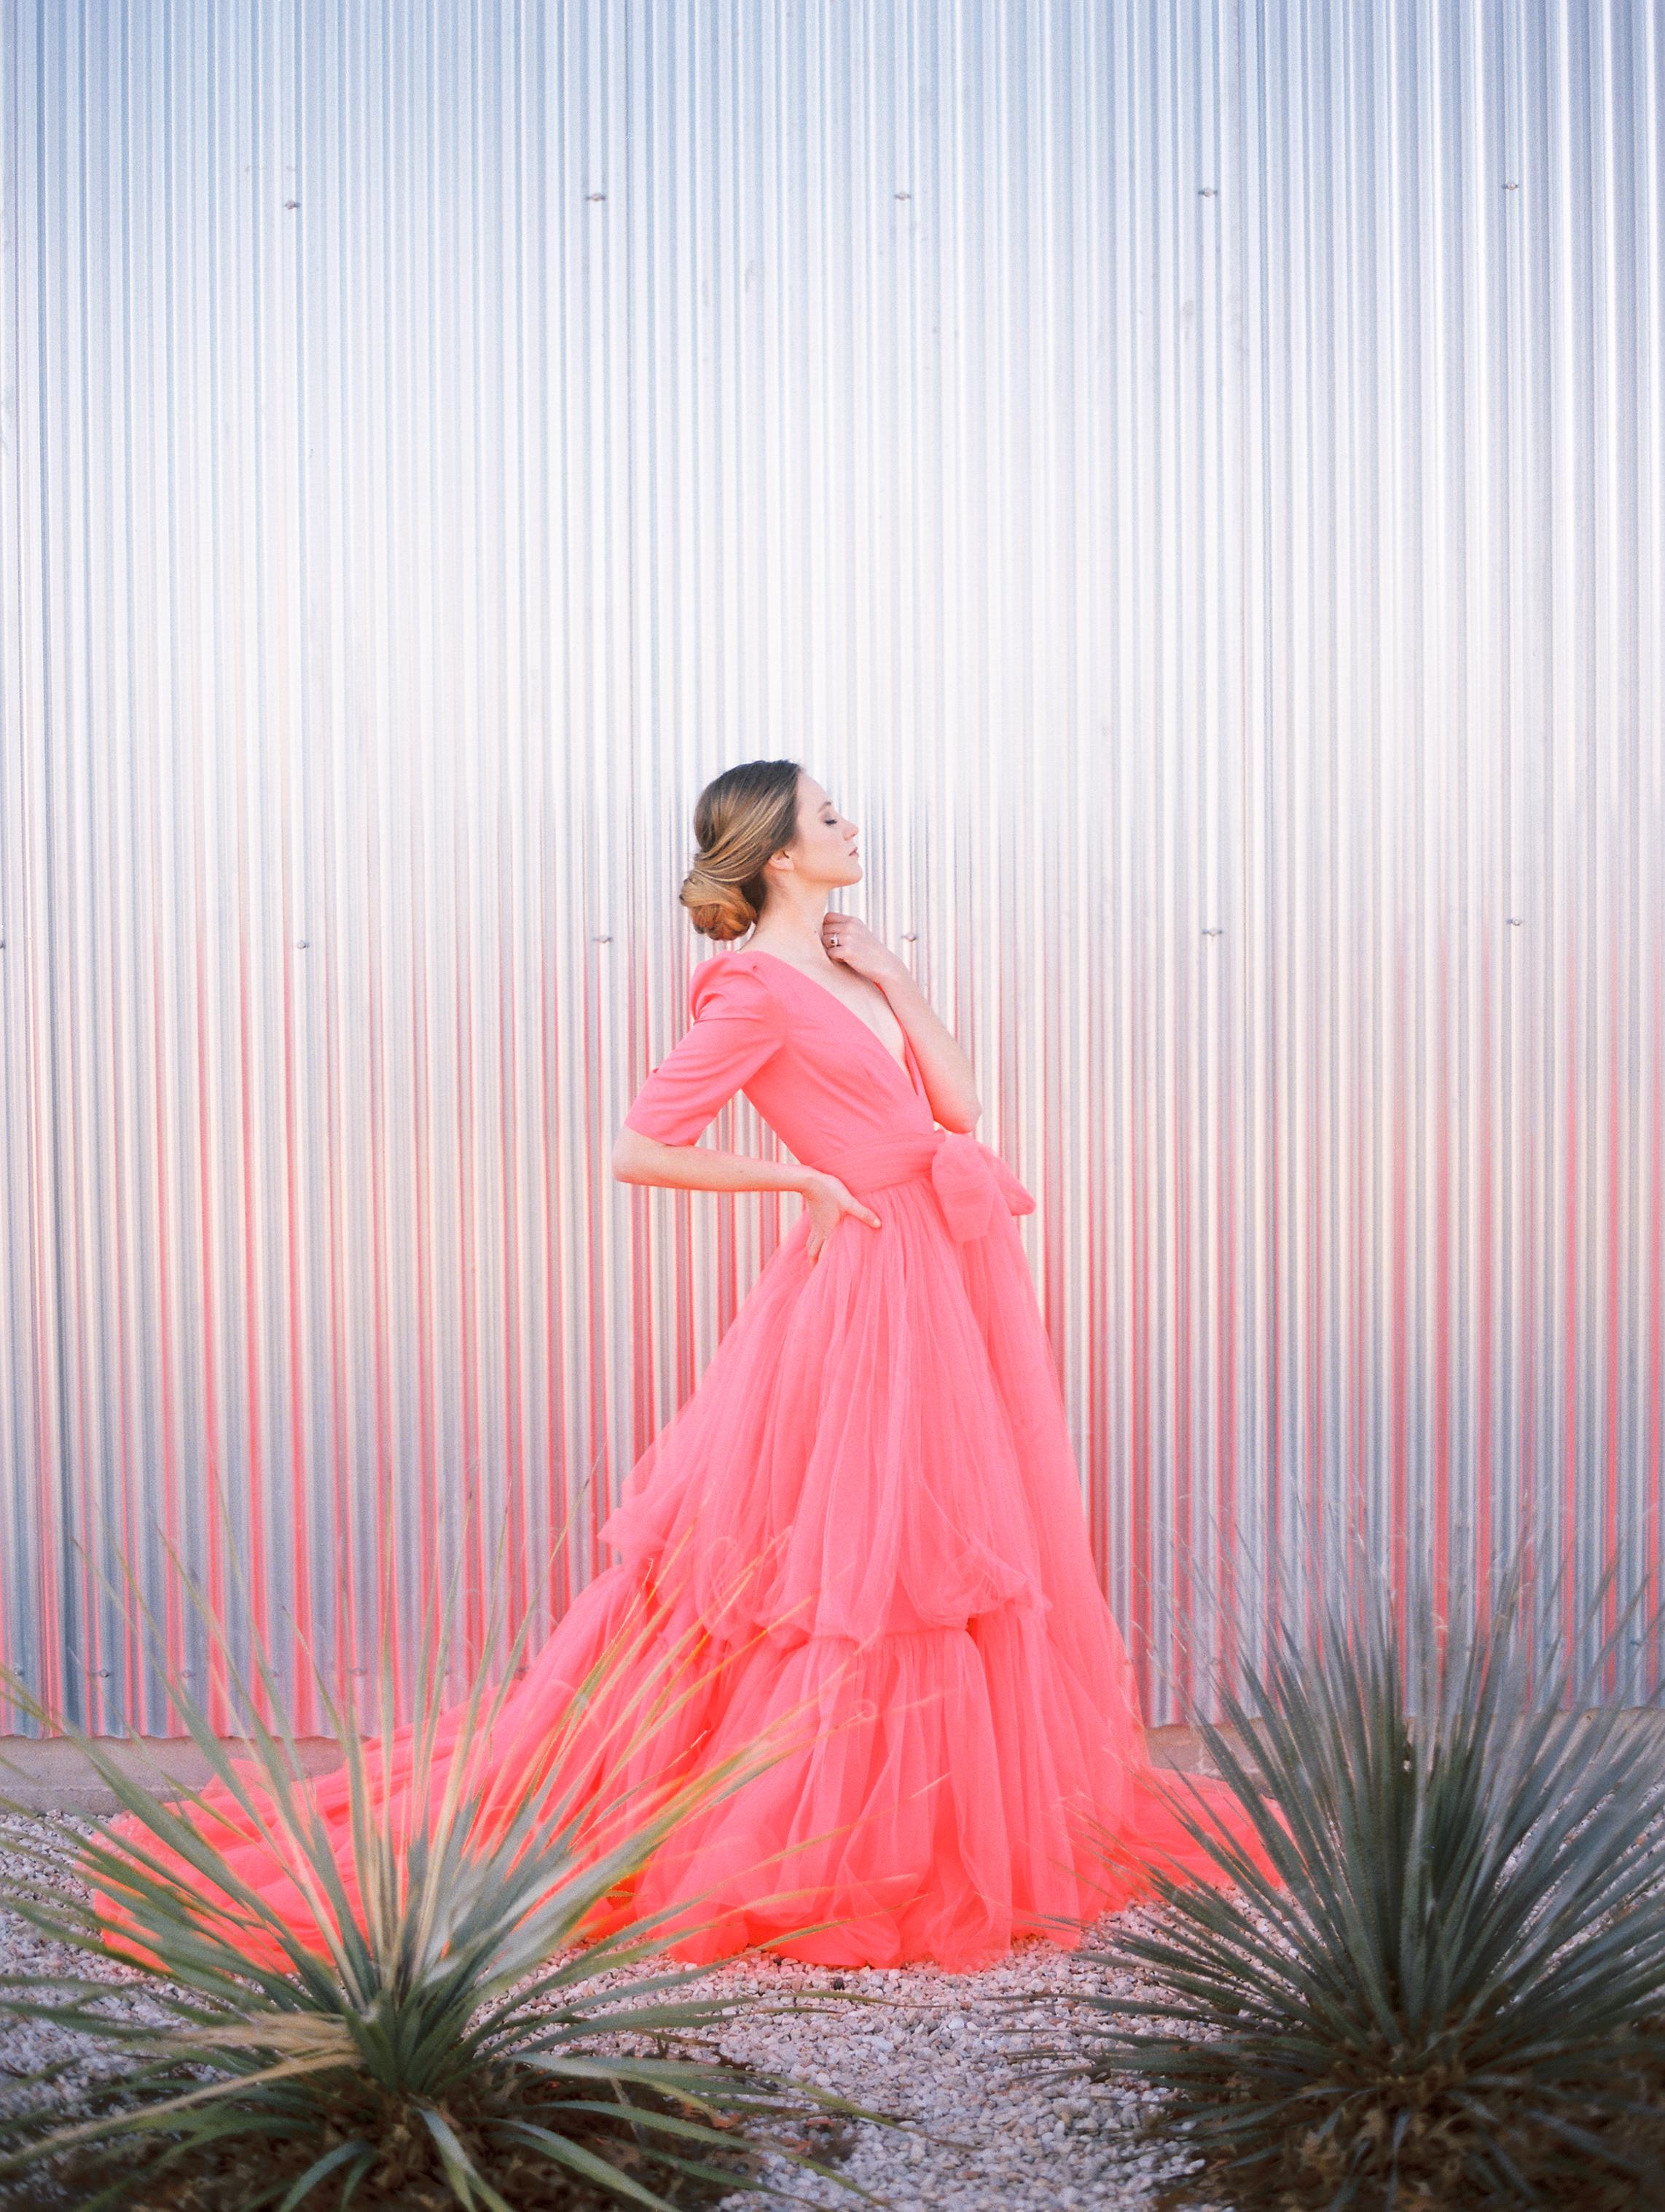 Kristin-La-Voie-Photography-Austin-Wedding-Photographer-Prospect-House-24.jpg